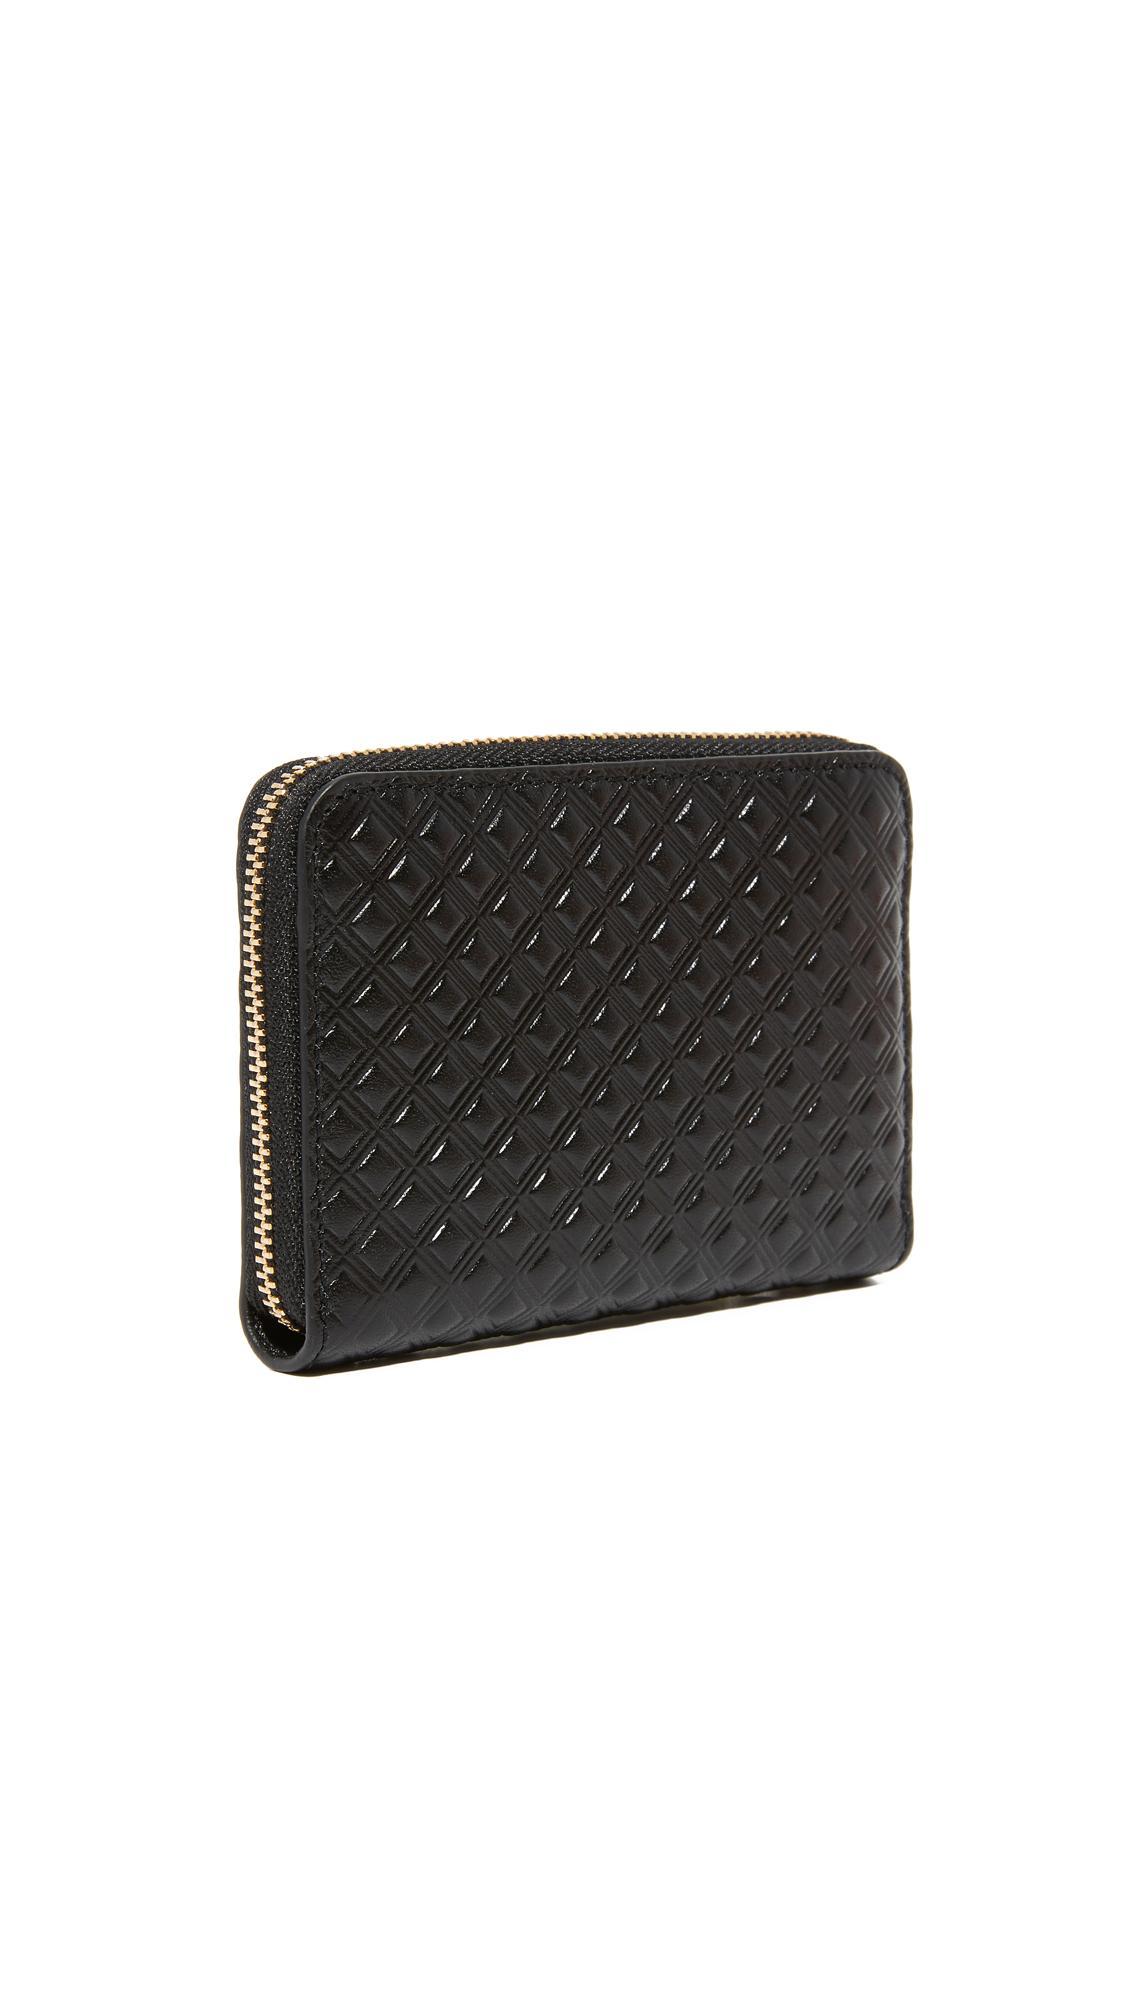 Kate Spade Iphone 5 Case Card Holder